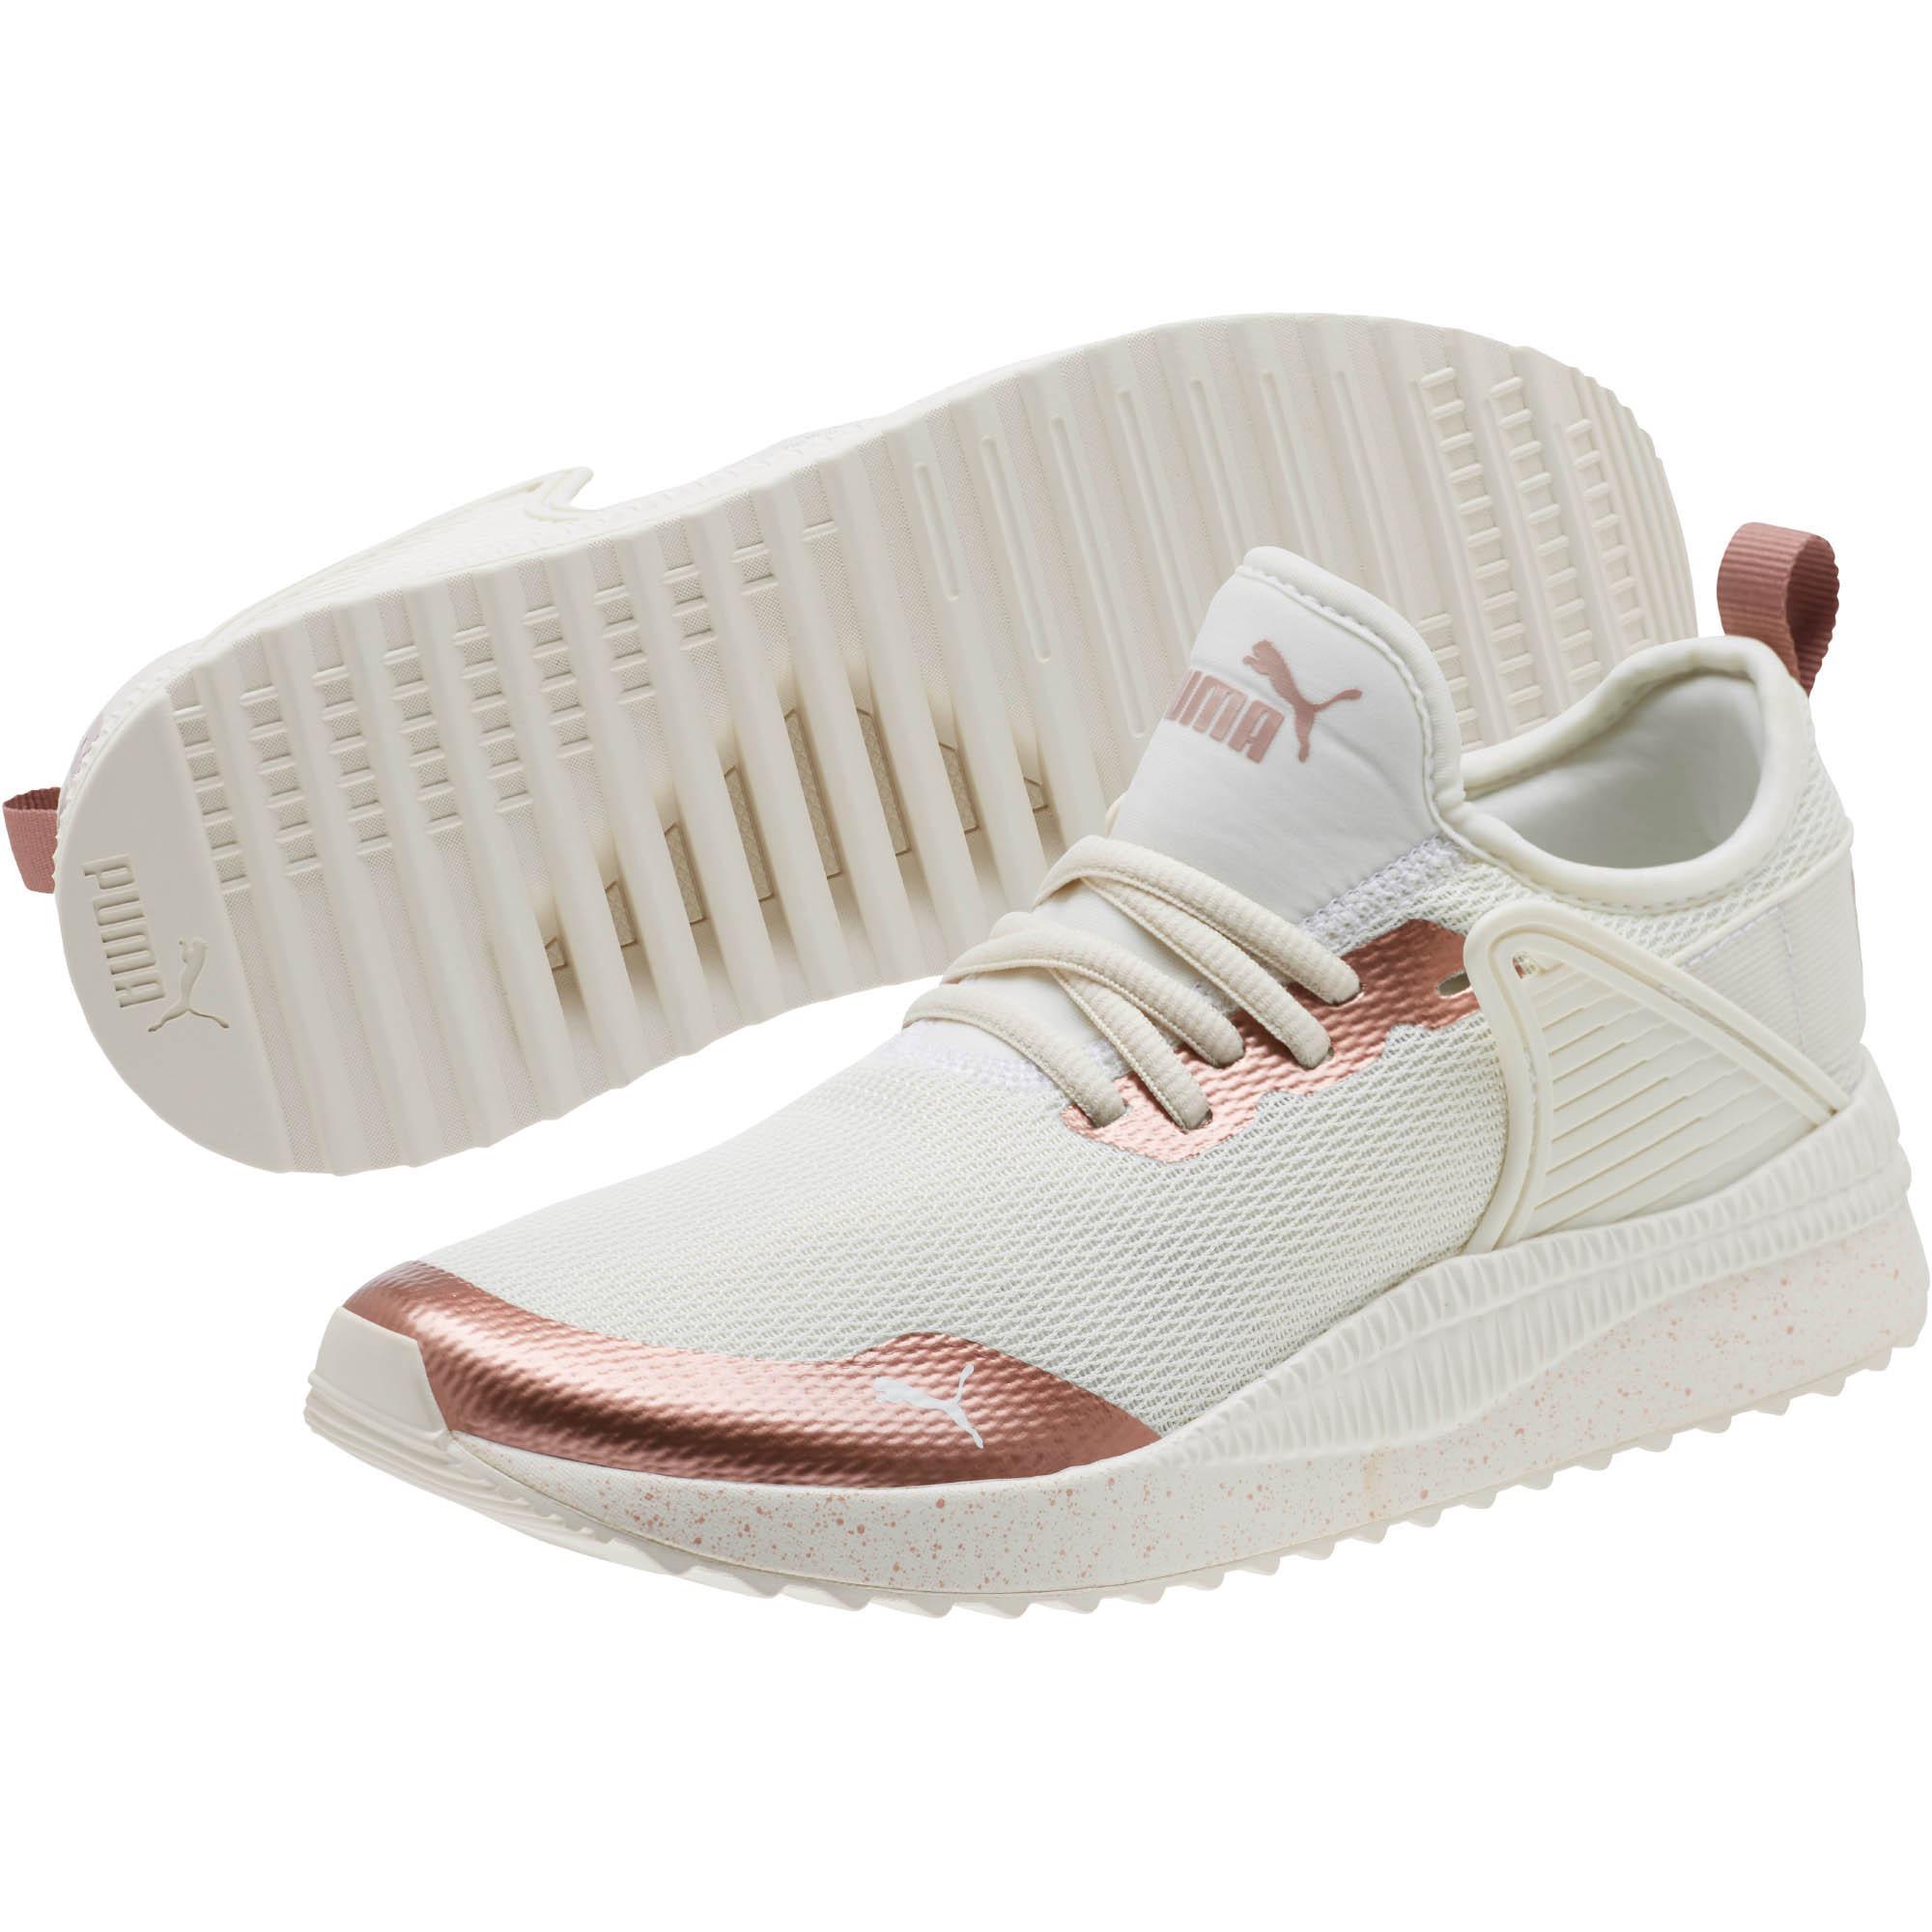 b472600852eacb ... Pacer Nex Tcage Metallic Speckle Women s Sneakers - Lyst. View  fullscreen